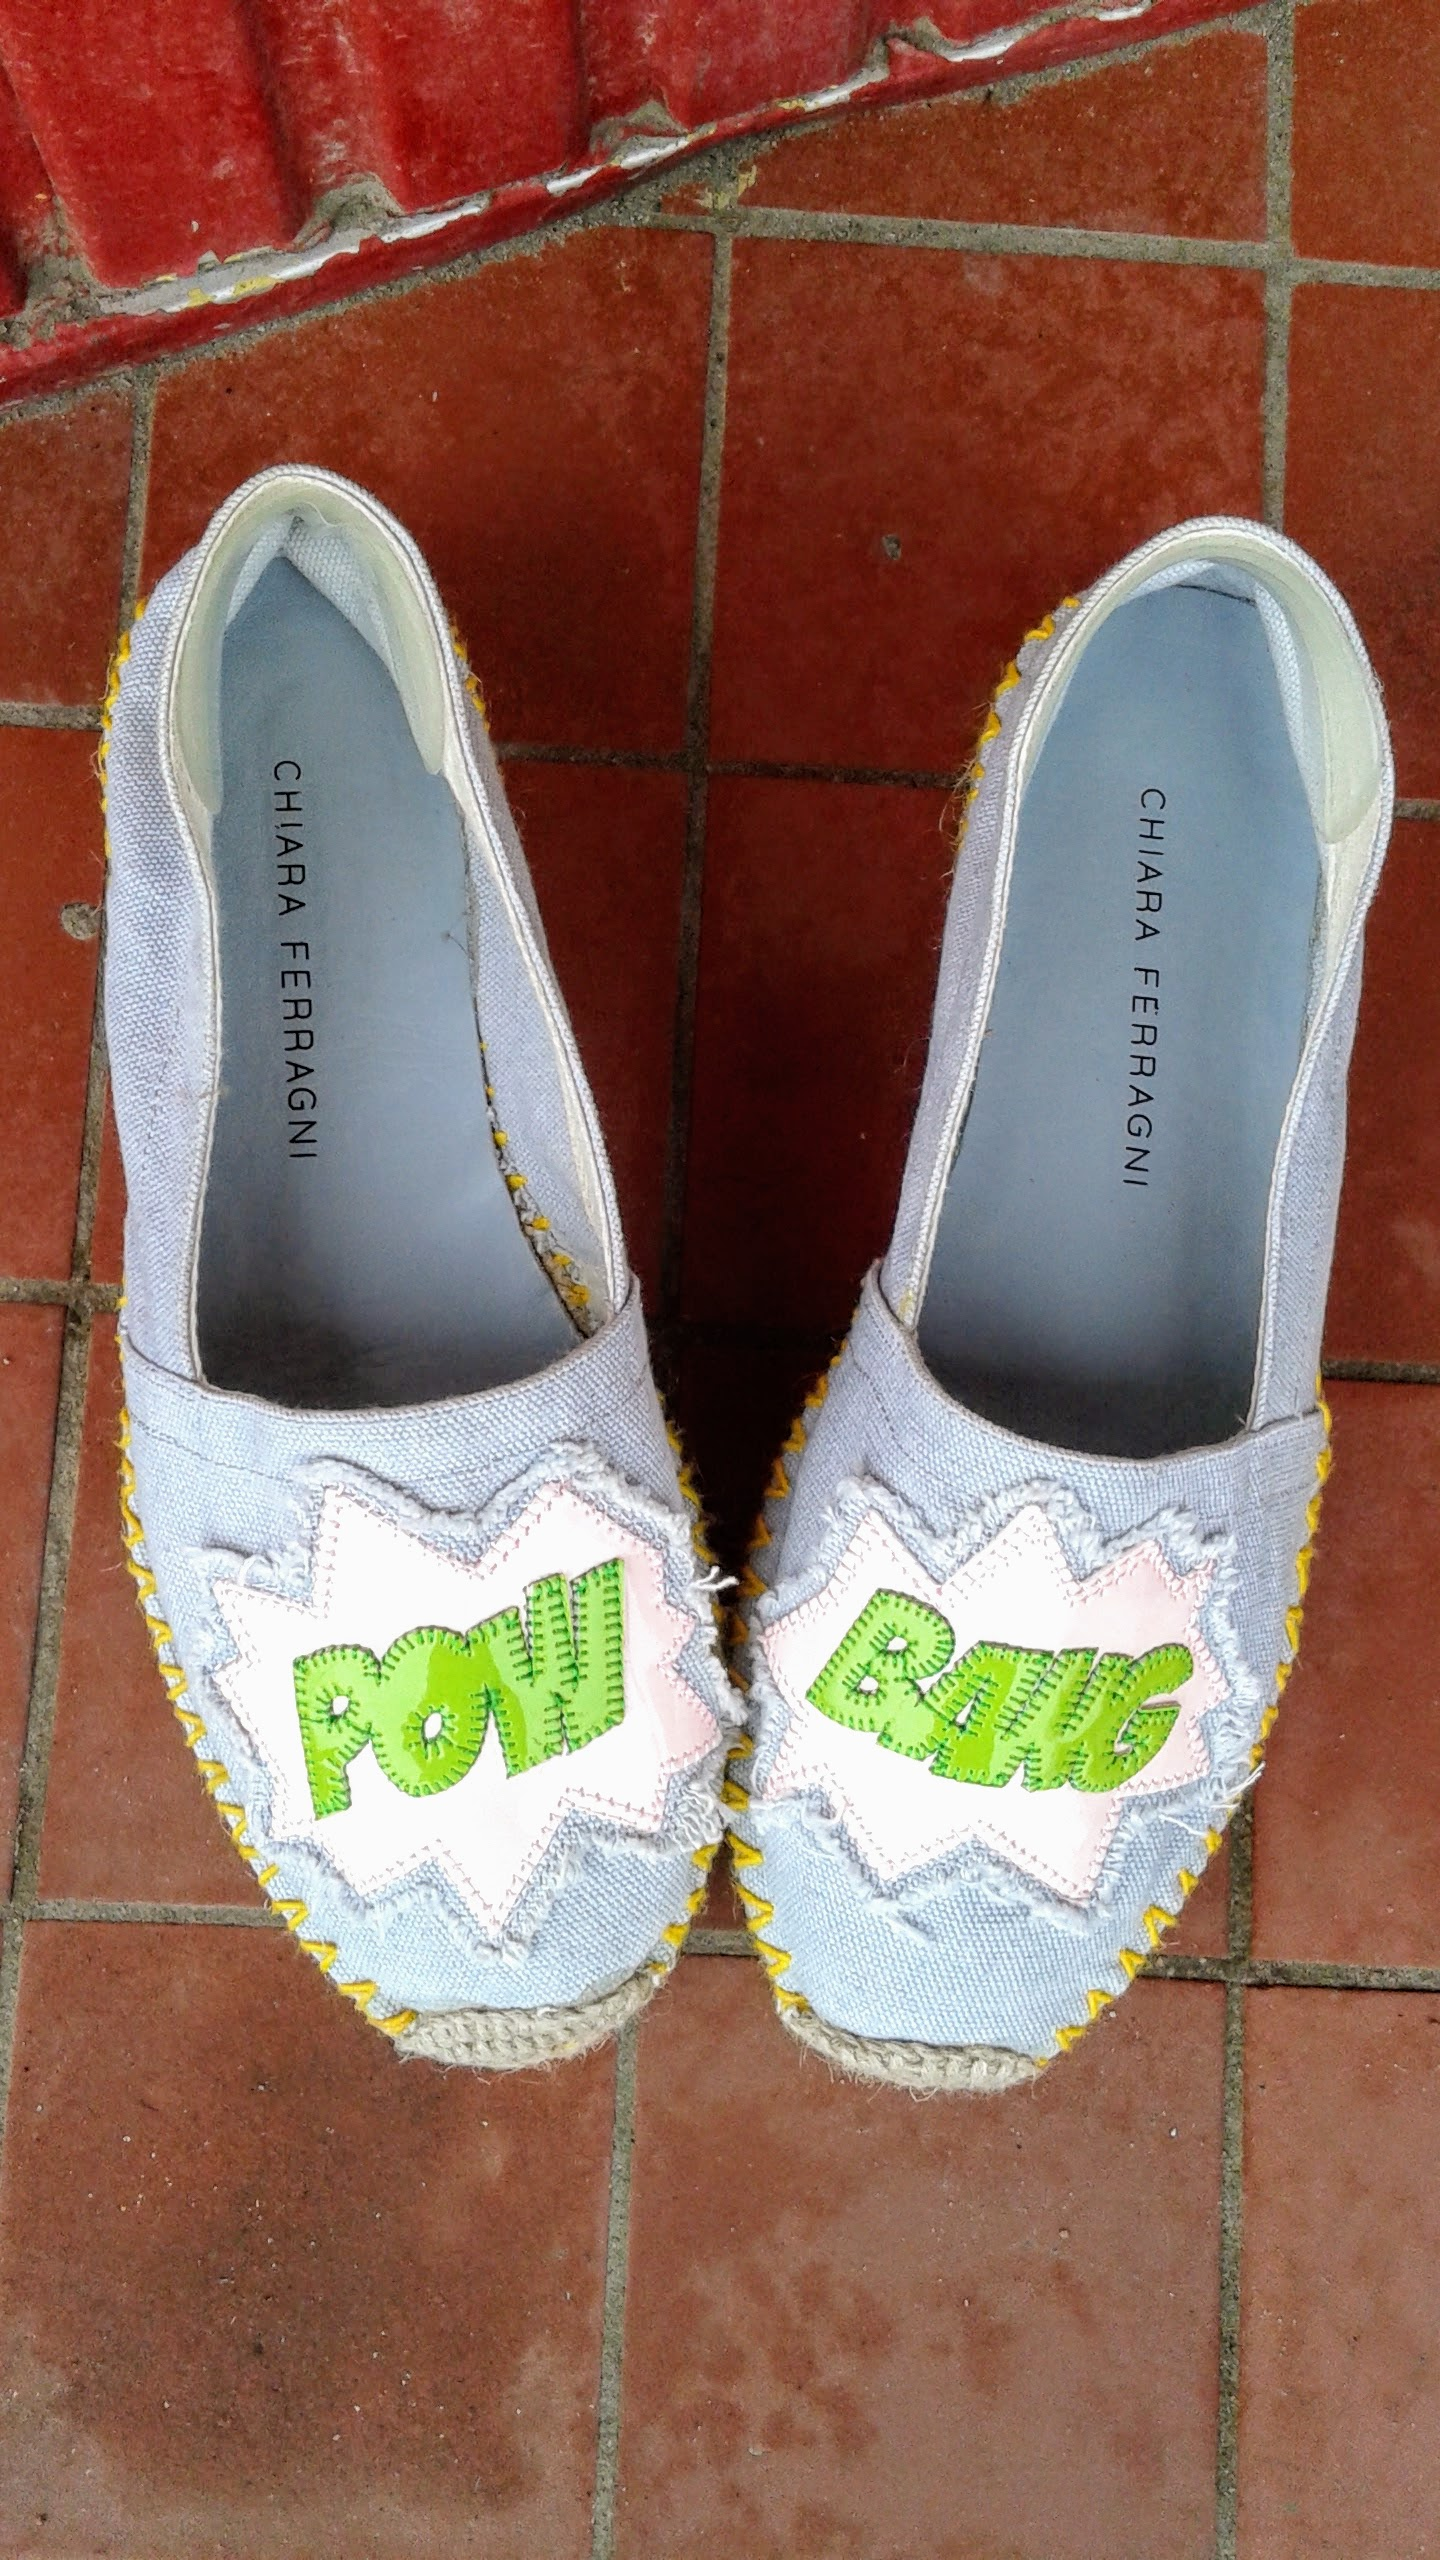 Chiara Ferragni  shoes; S9, $24